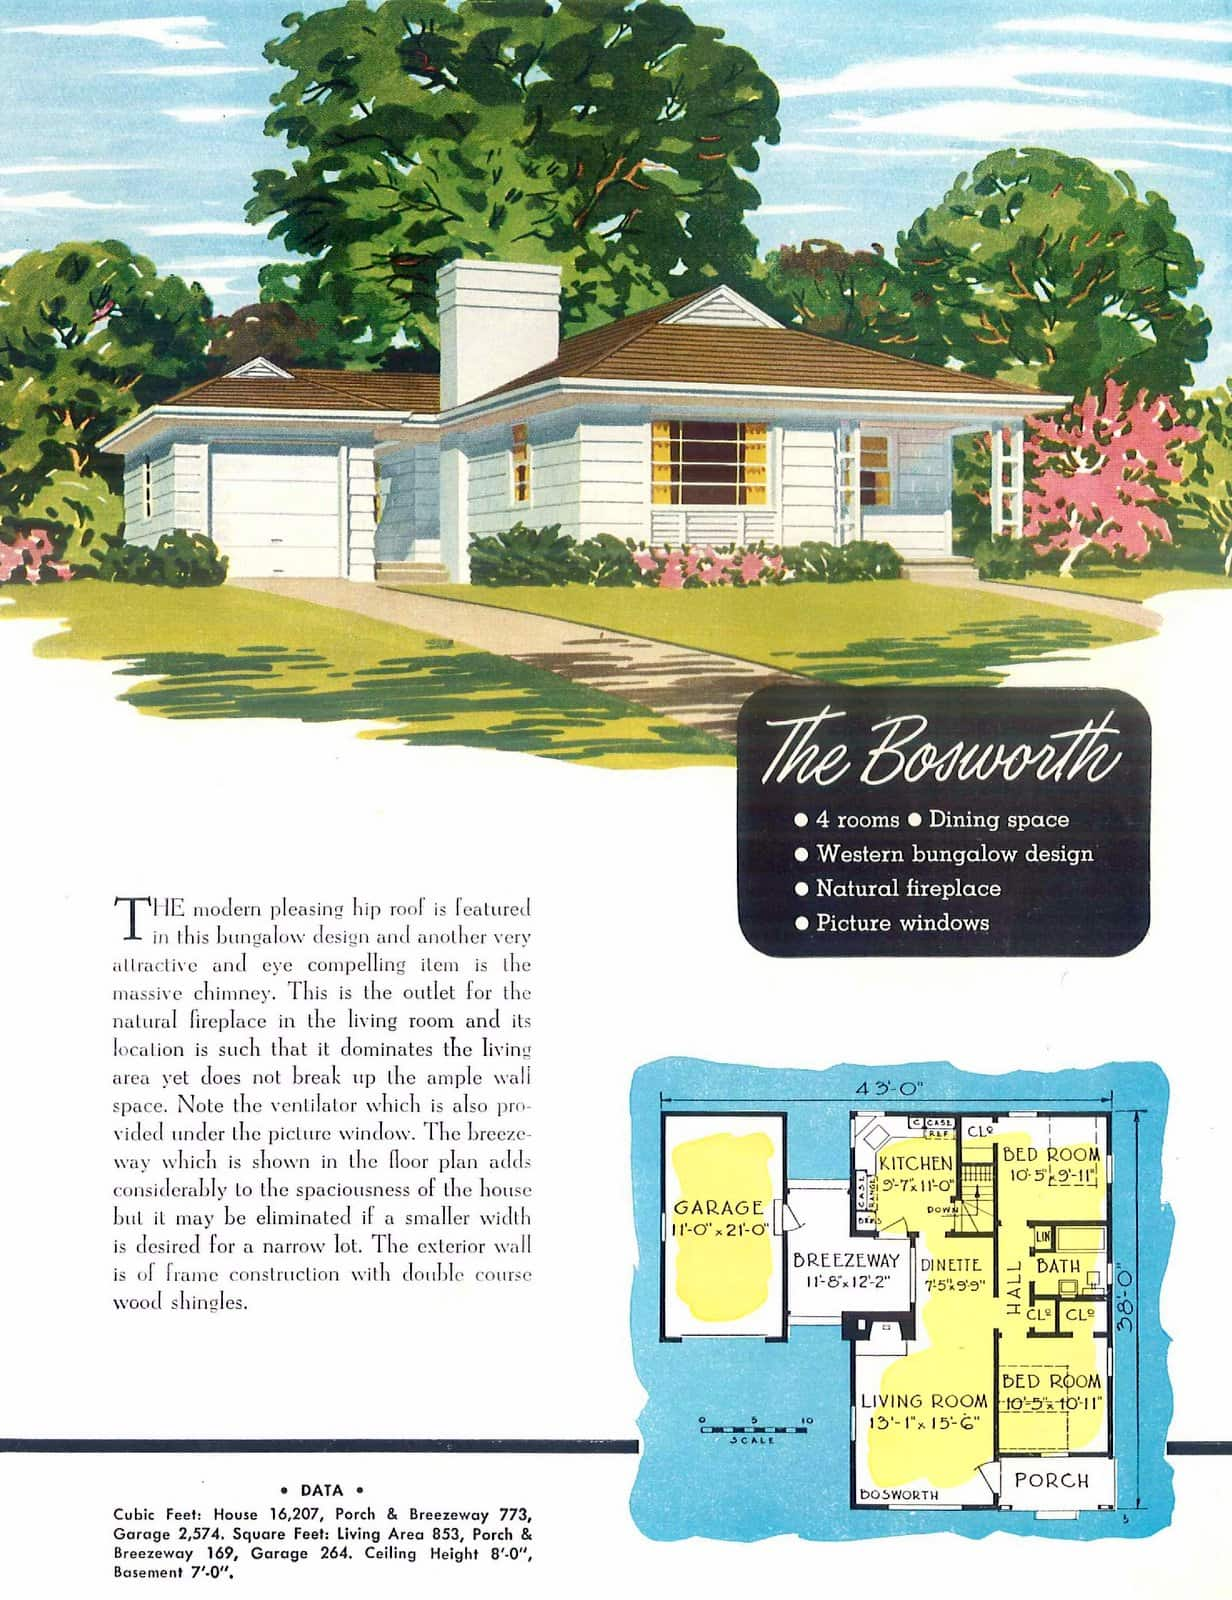 Vintage 40s post-war starter home designs from 1949 (5)